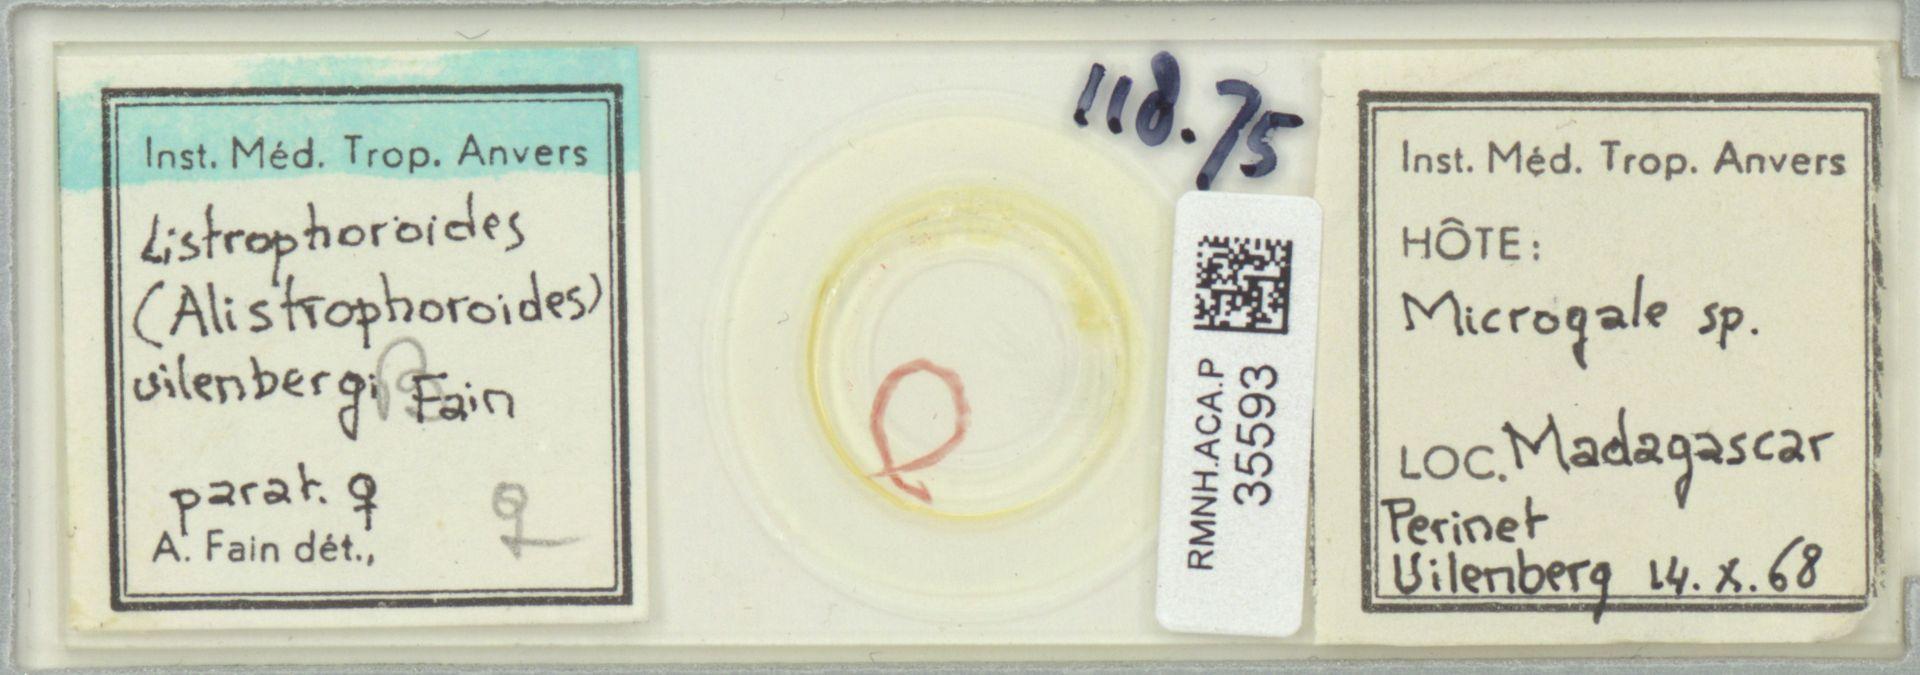 RMNH.ACA.P.35593 | Listrophoroides (Alistrophoroides) uilenbergi Fain